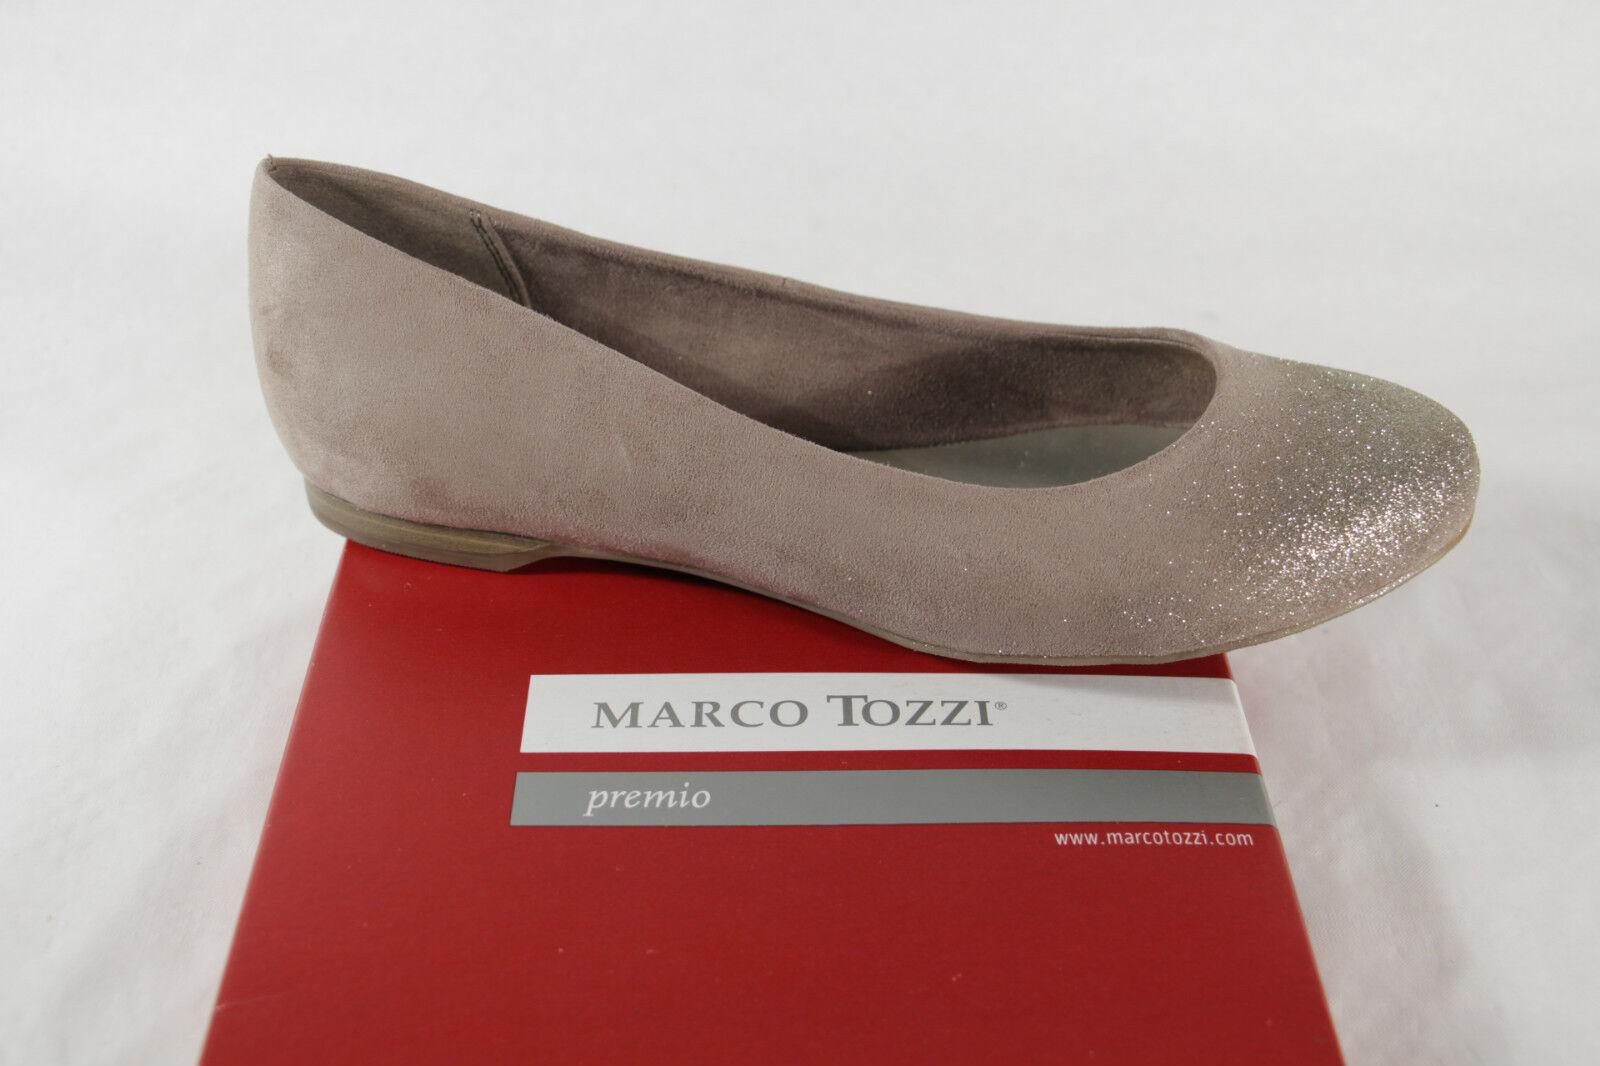 Marco Tozzi Ballerine 22104 Mocassins Beige Doré Simili-Cuir Neuf